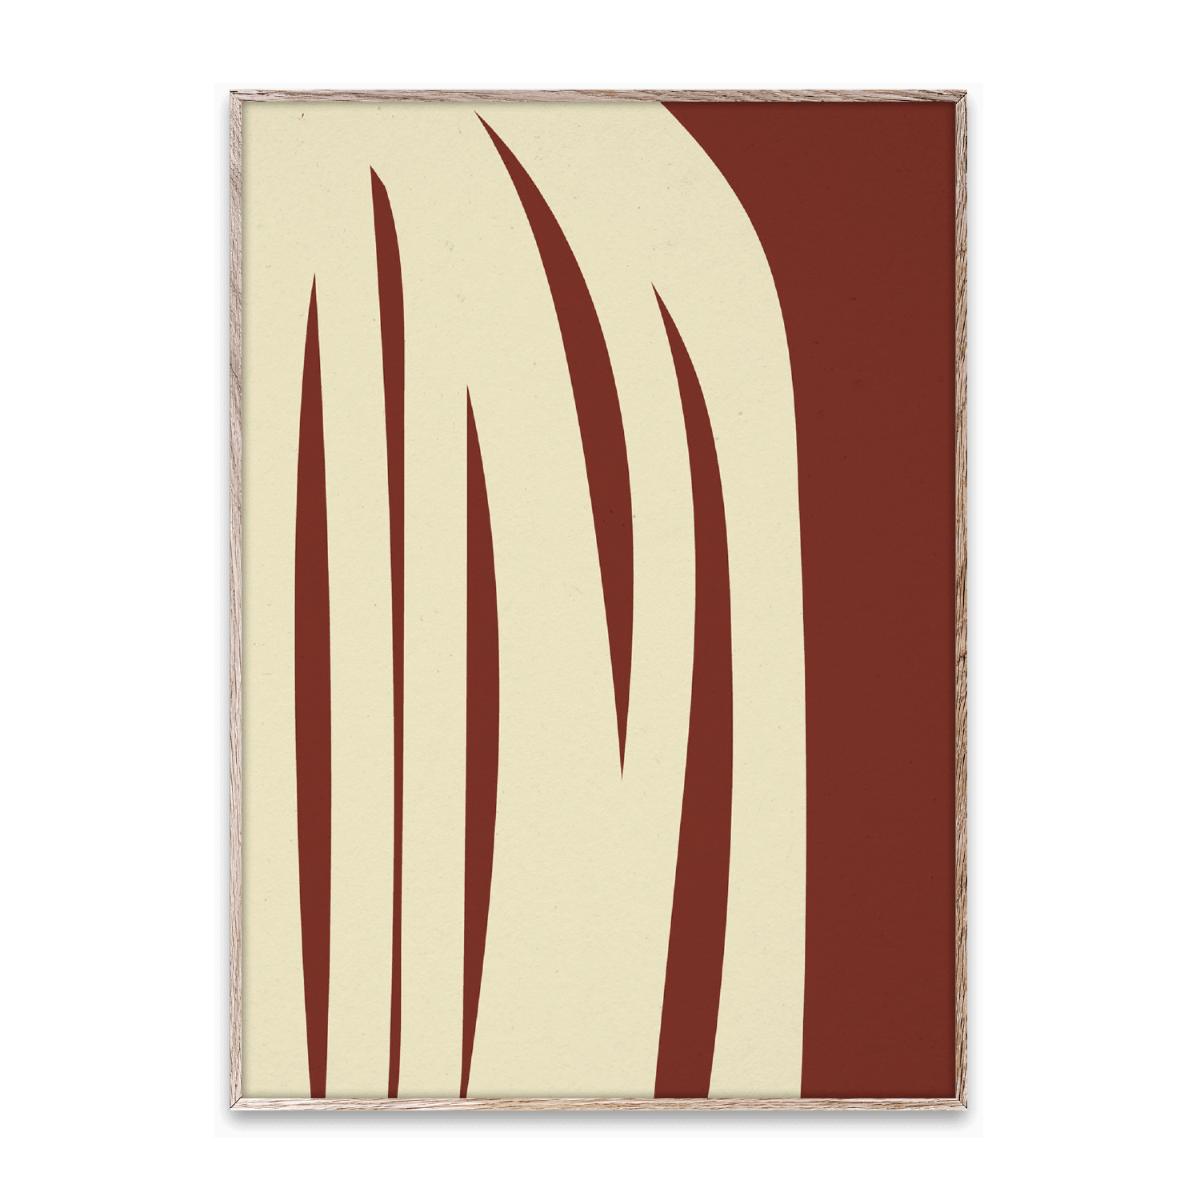 Designtorget Poster Stacked Lines 02 50x70 cm